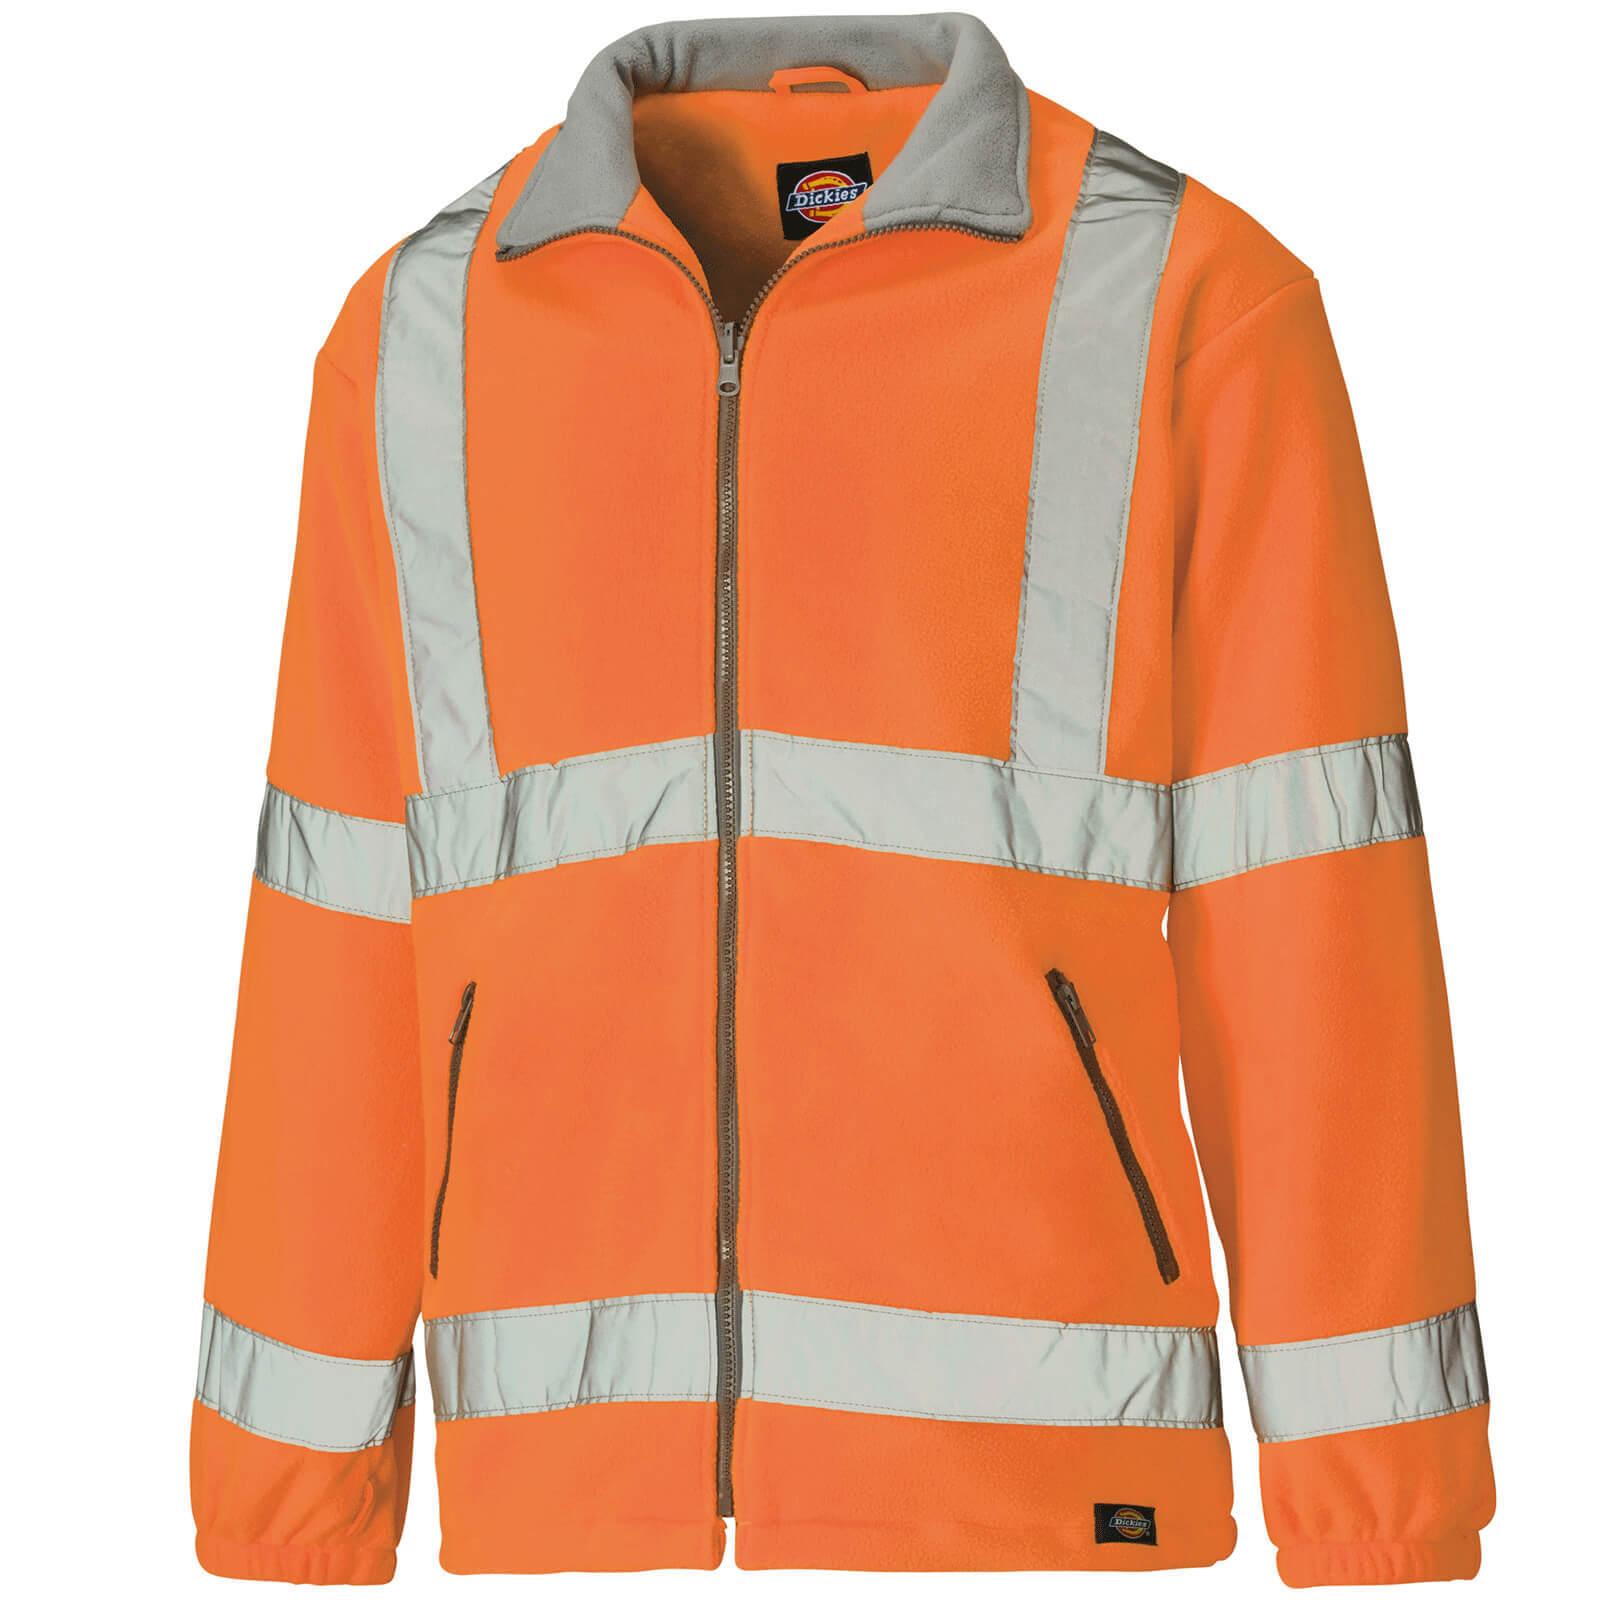 Image of Dickies High Vis Fleece Orange 2XL